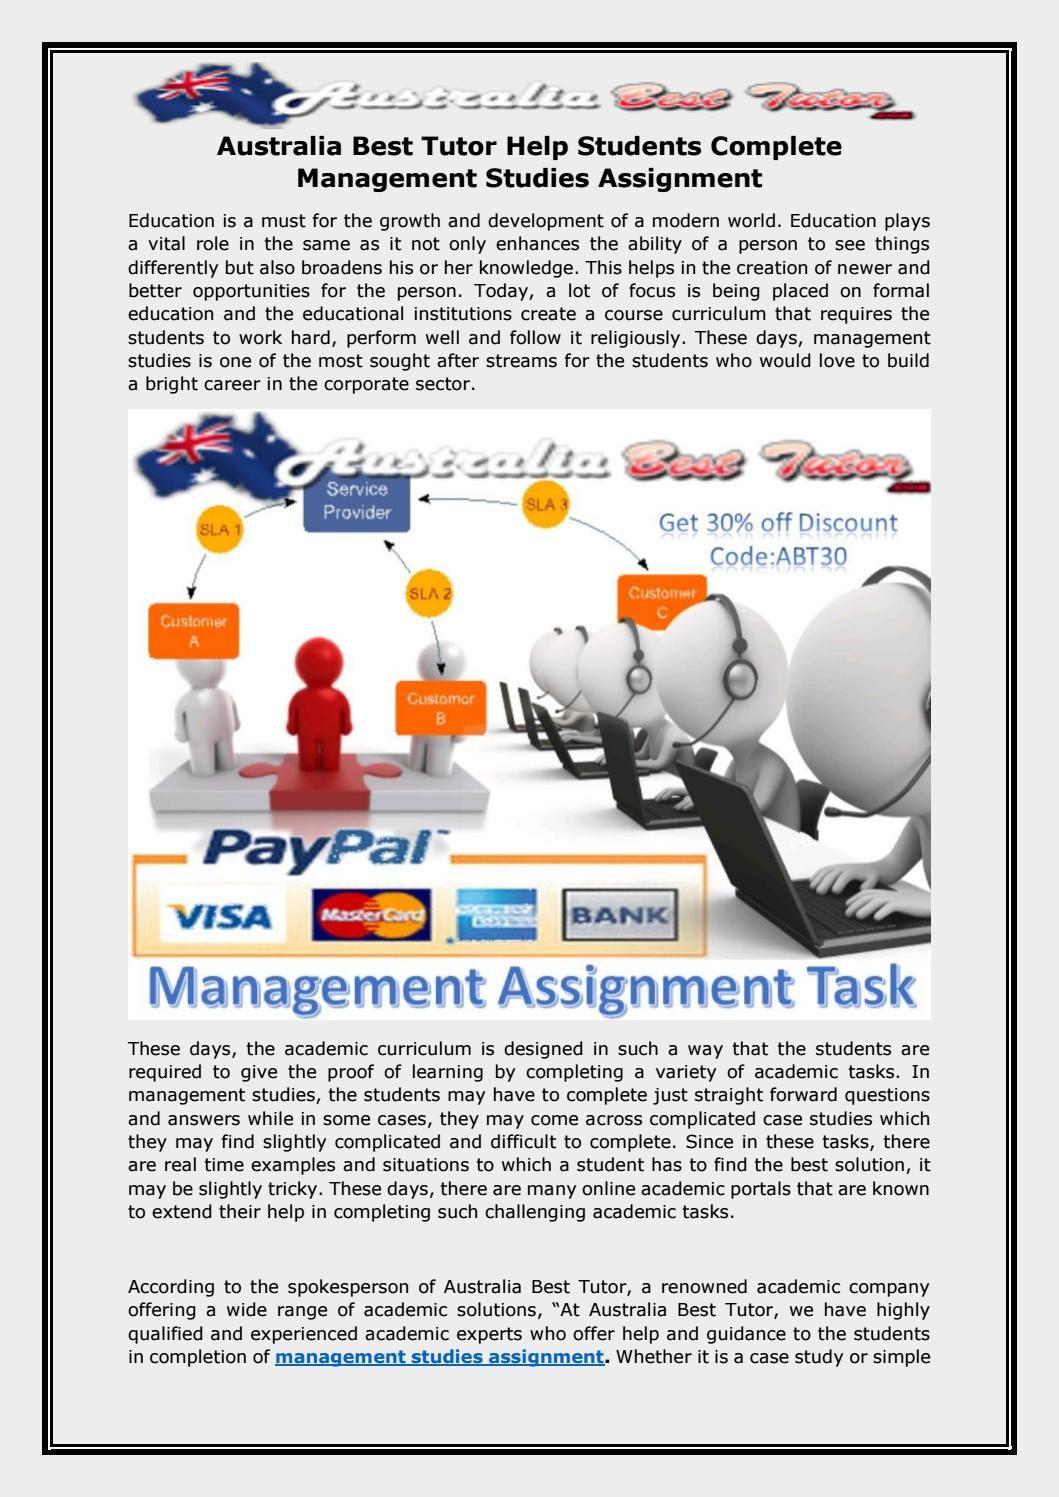 Australia Best Tutor Help Students Complete Management Studies